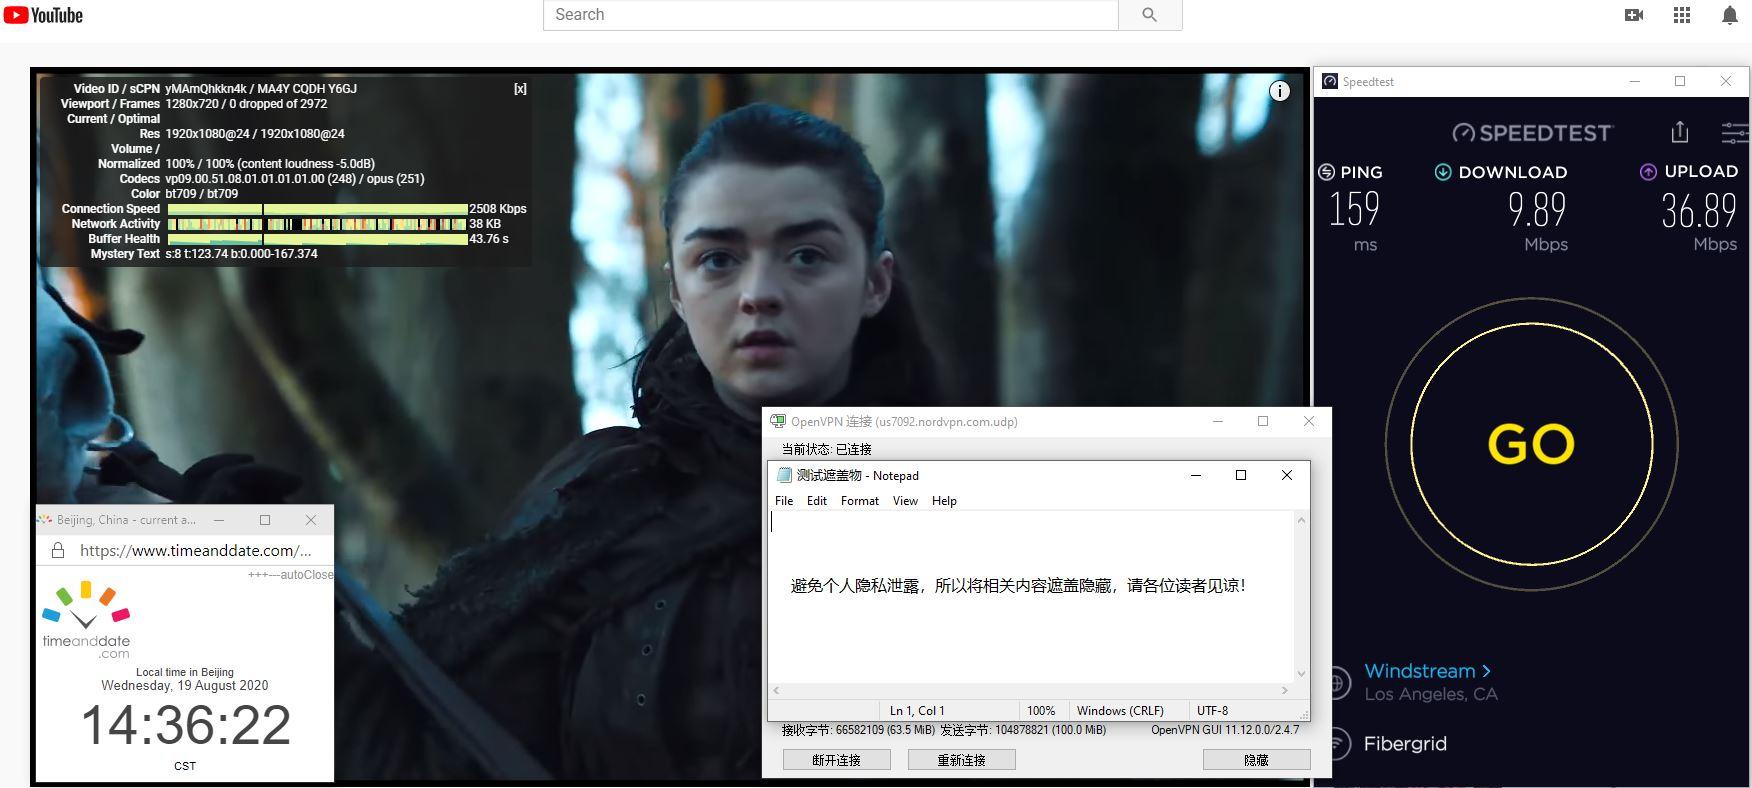 Windows10 NordVPN OpenVPN us7092 中国VPN 翻墙 科学上网 翻墙速度测试 - 20200819